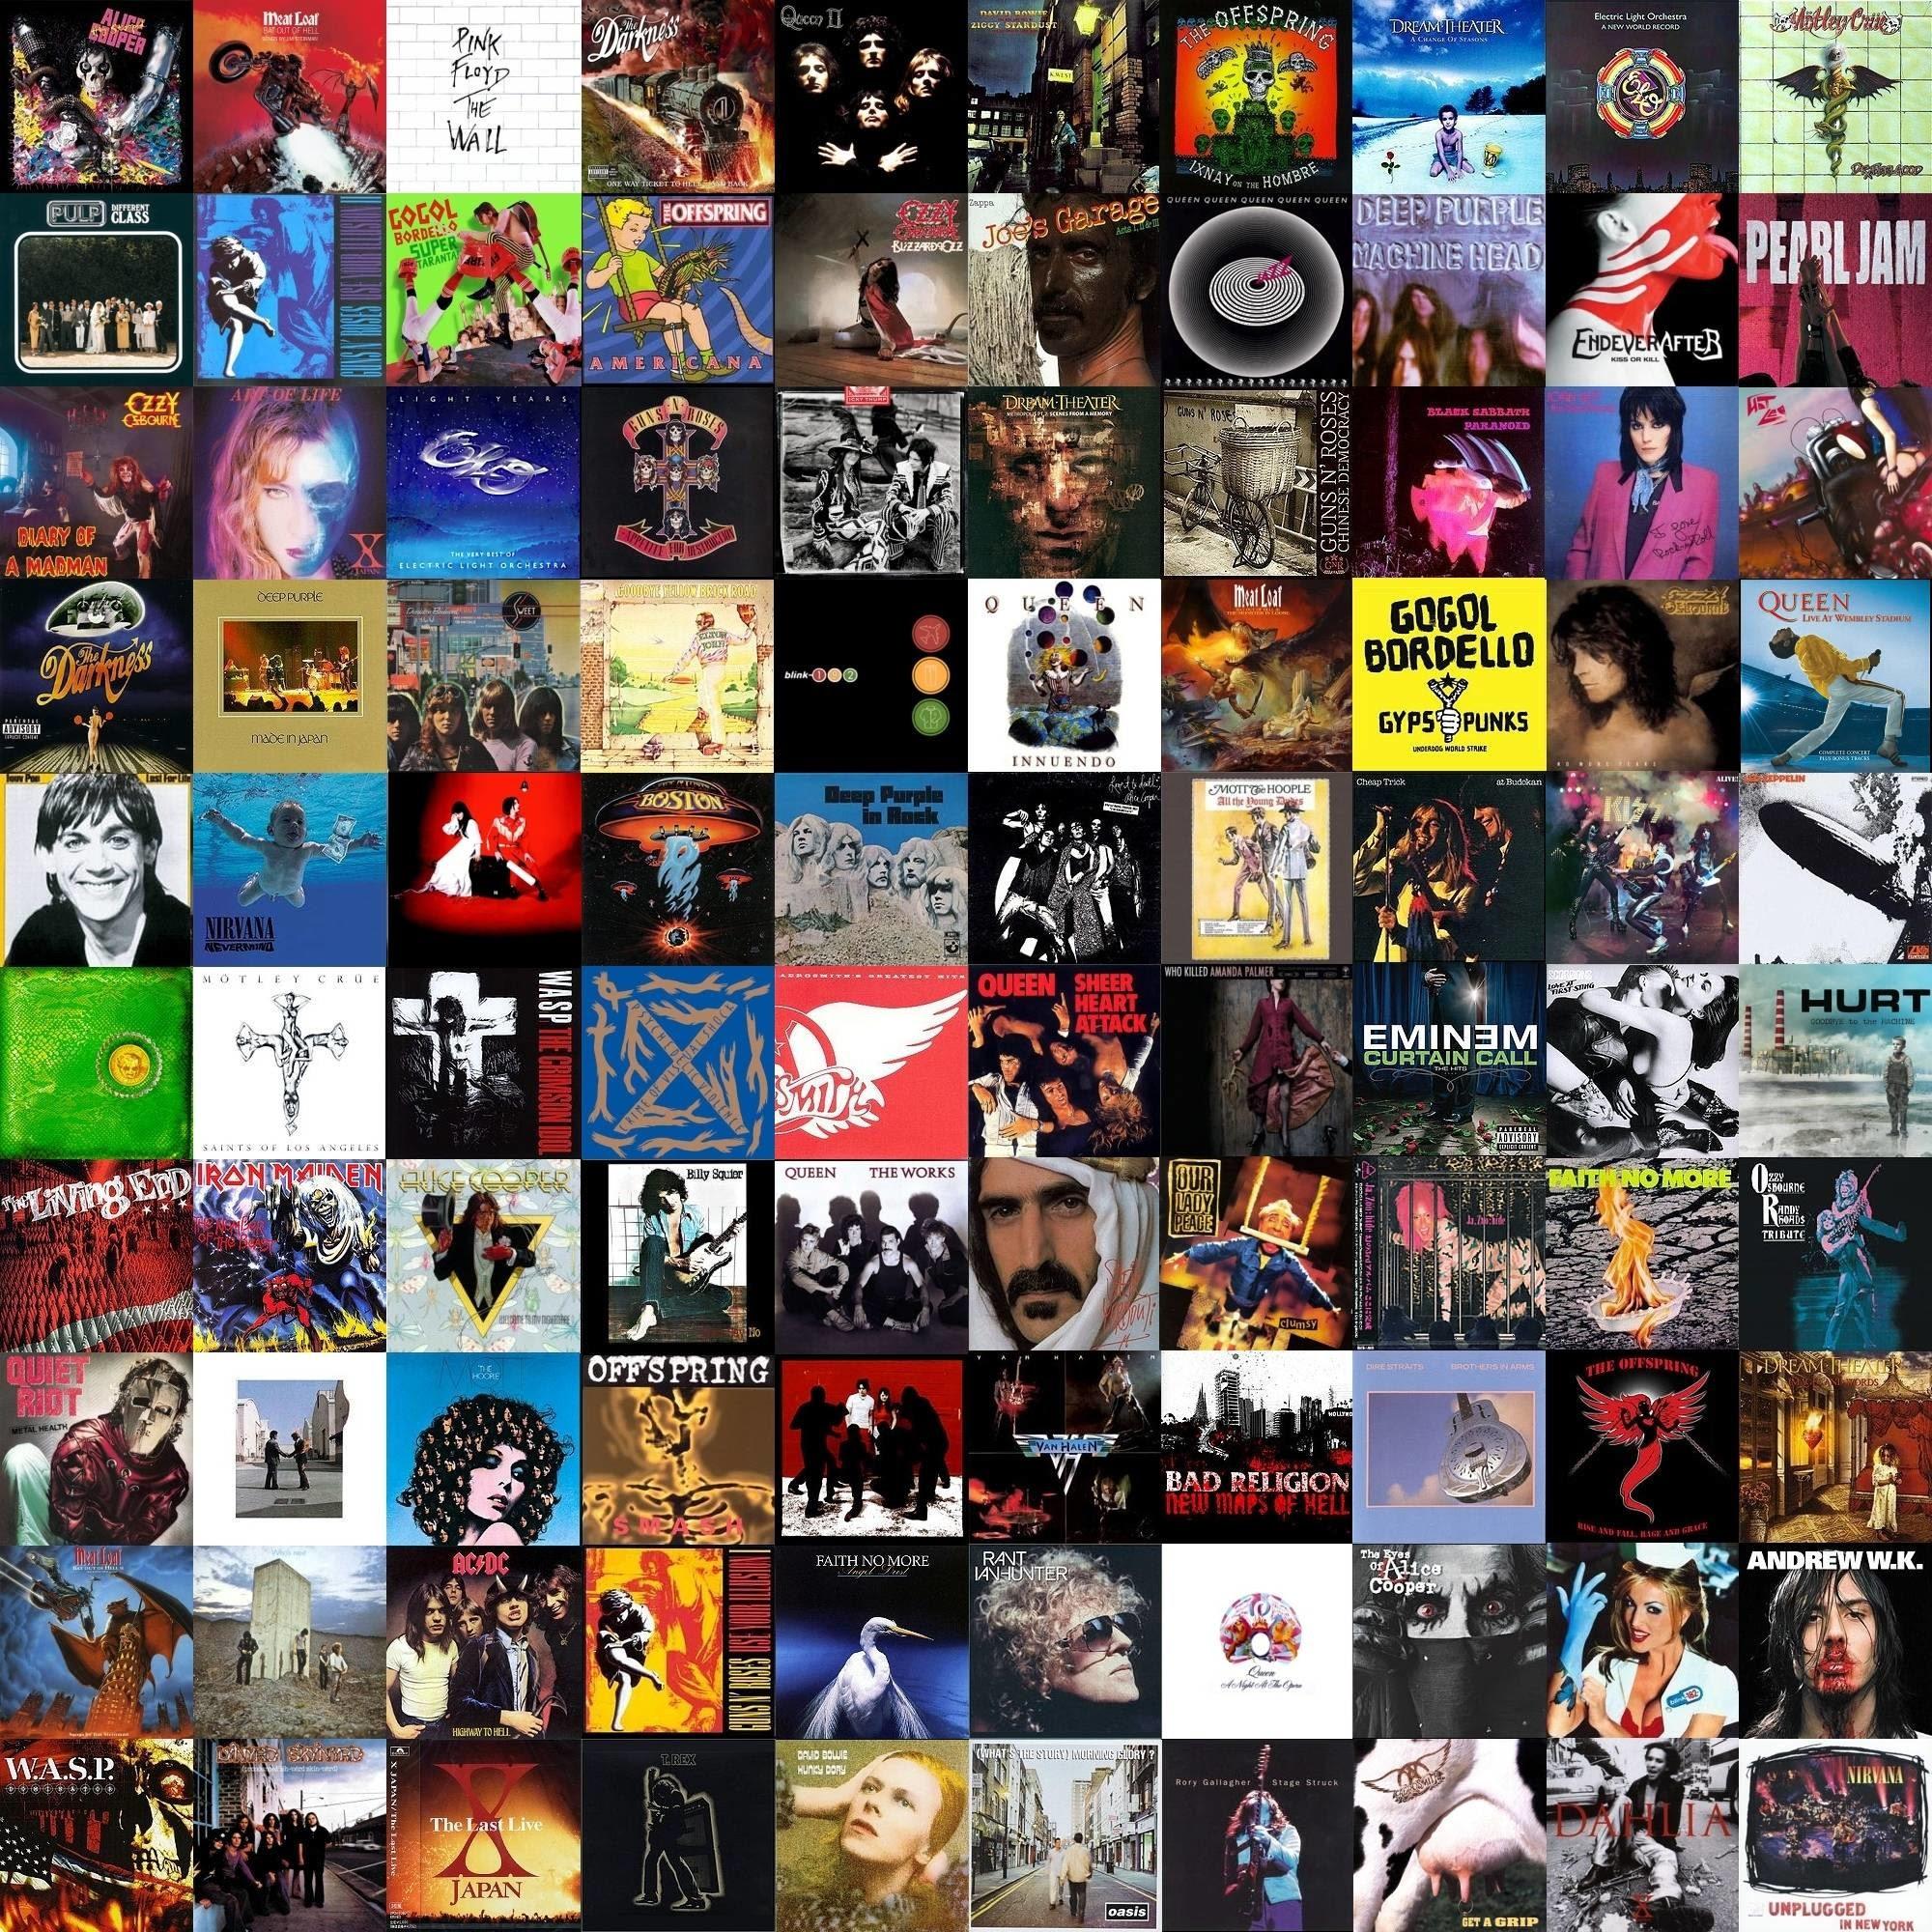 Classic Rock Album Covers Wallpaper 63 Images